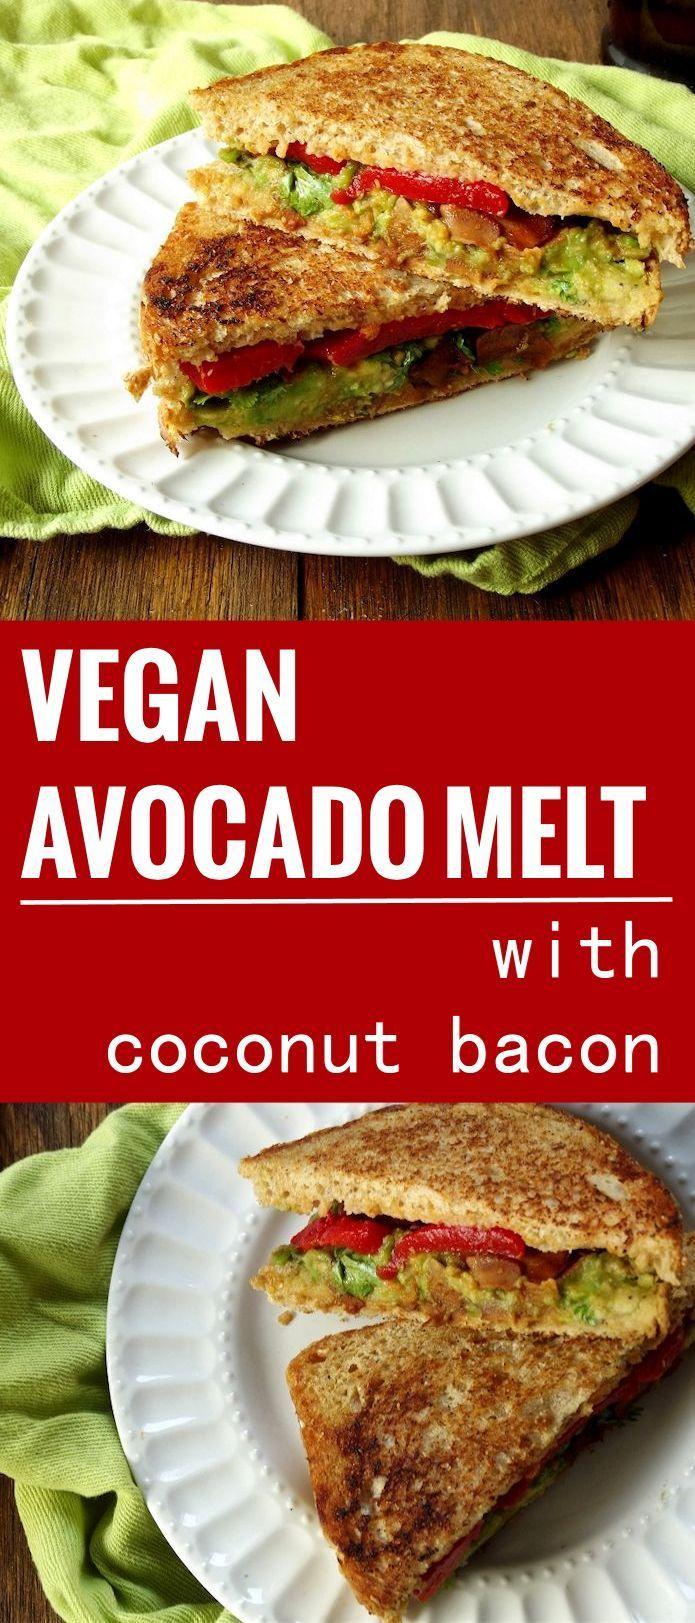 Vegan Avocado Melt with Coconut Bacon